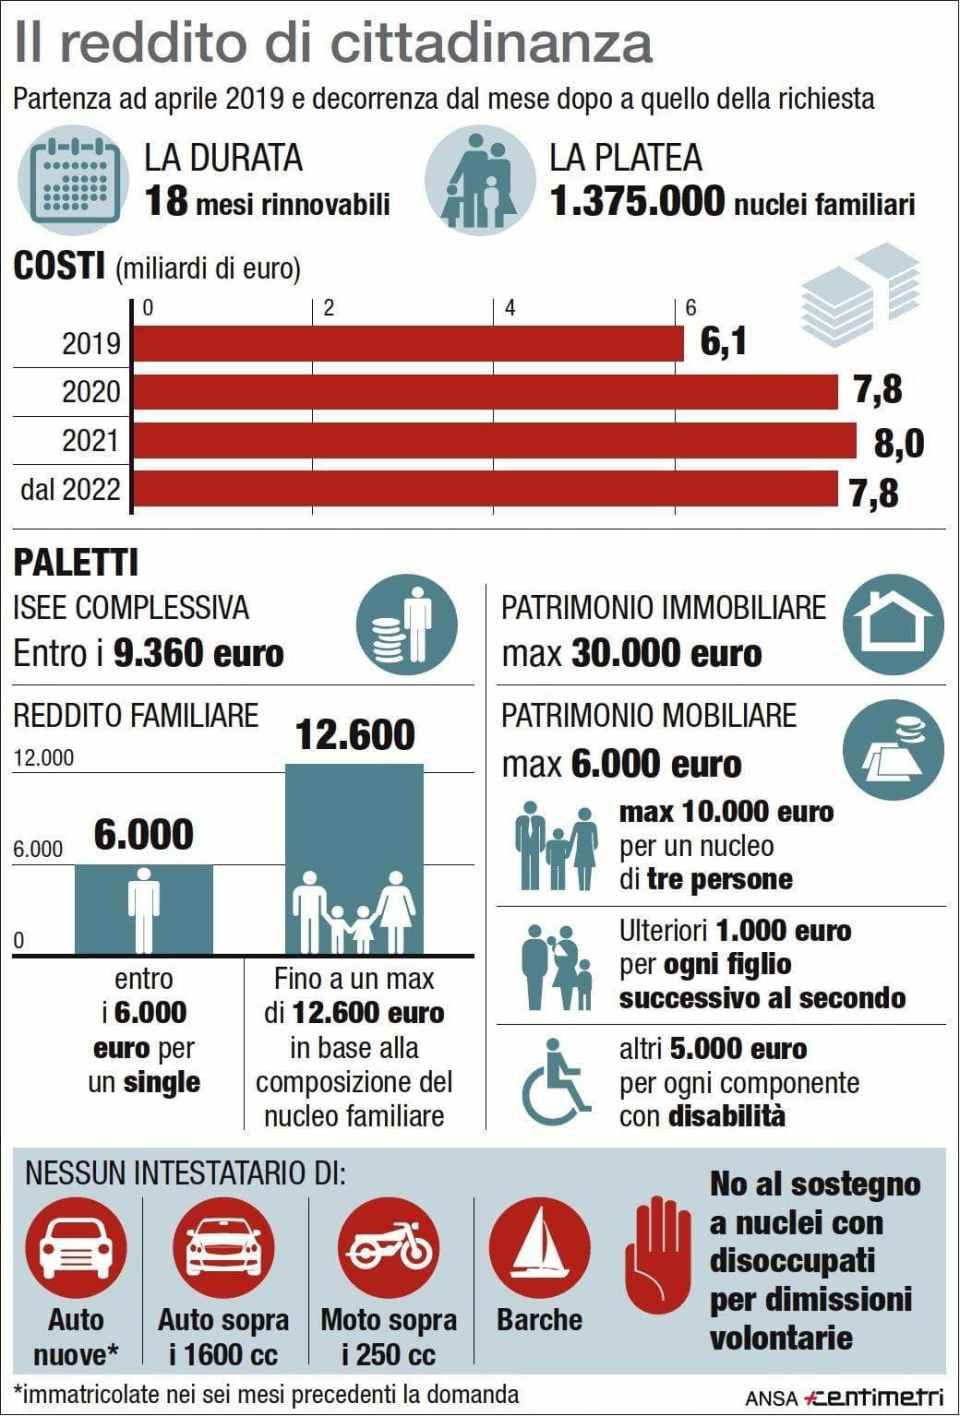 reddito cittadinanza infografica ansa-2